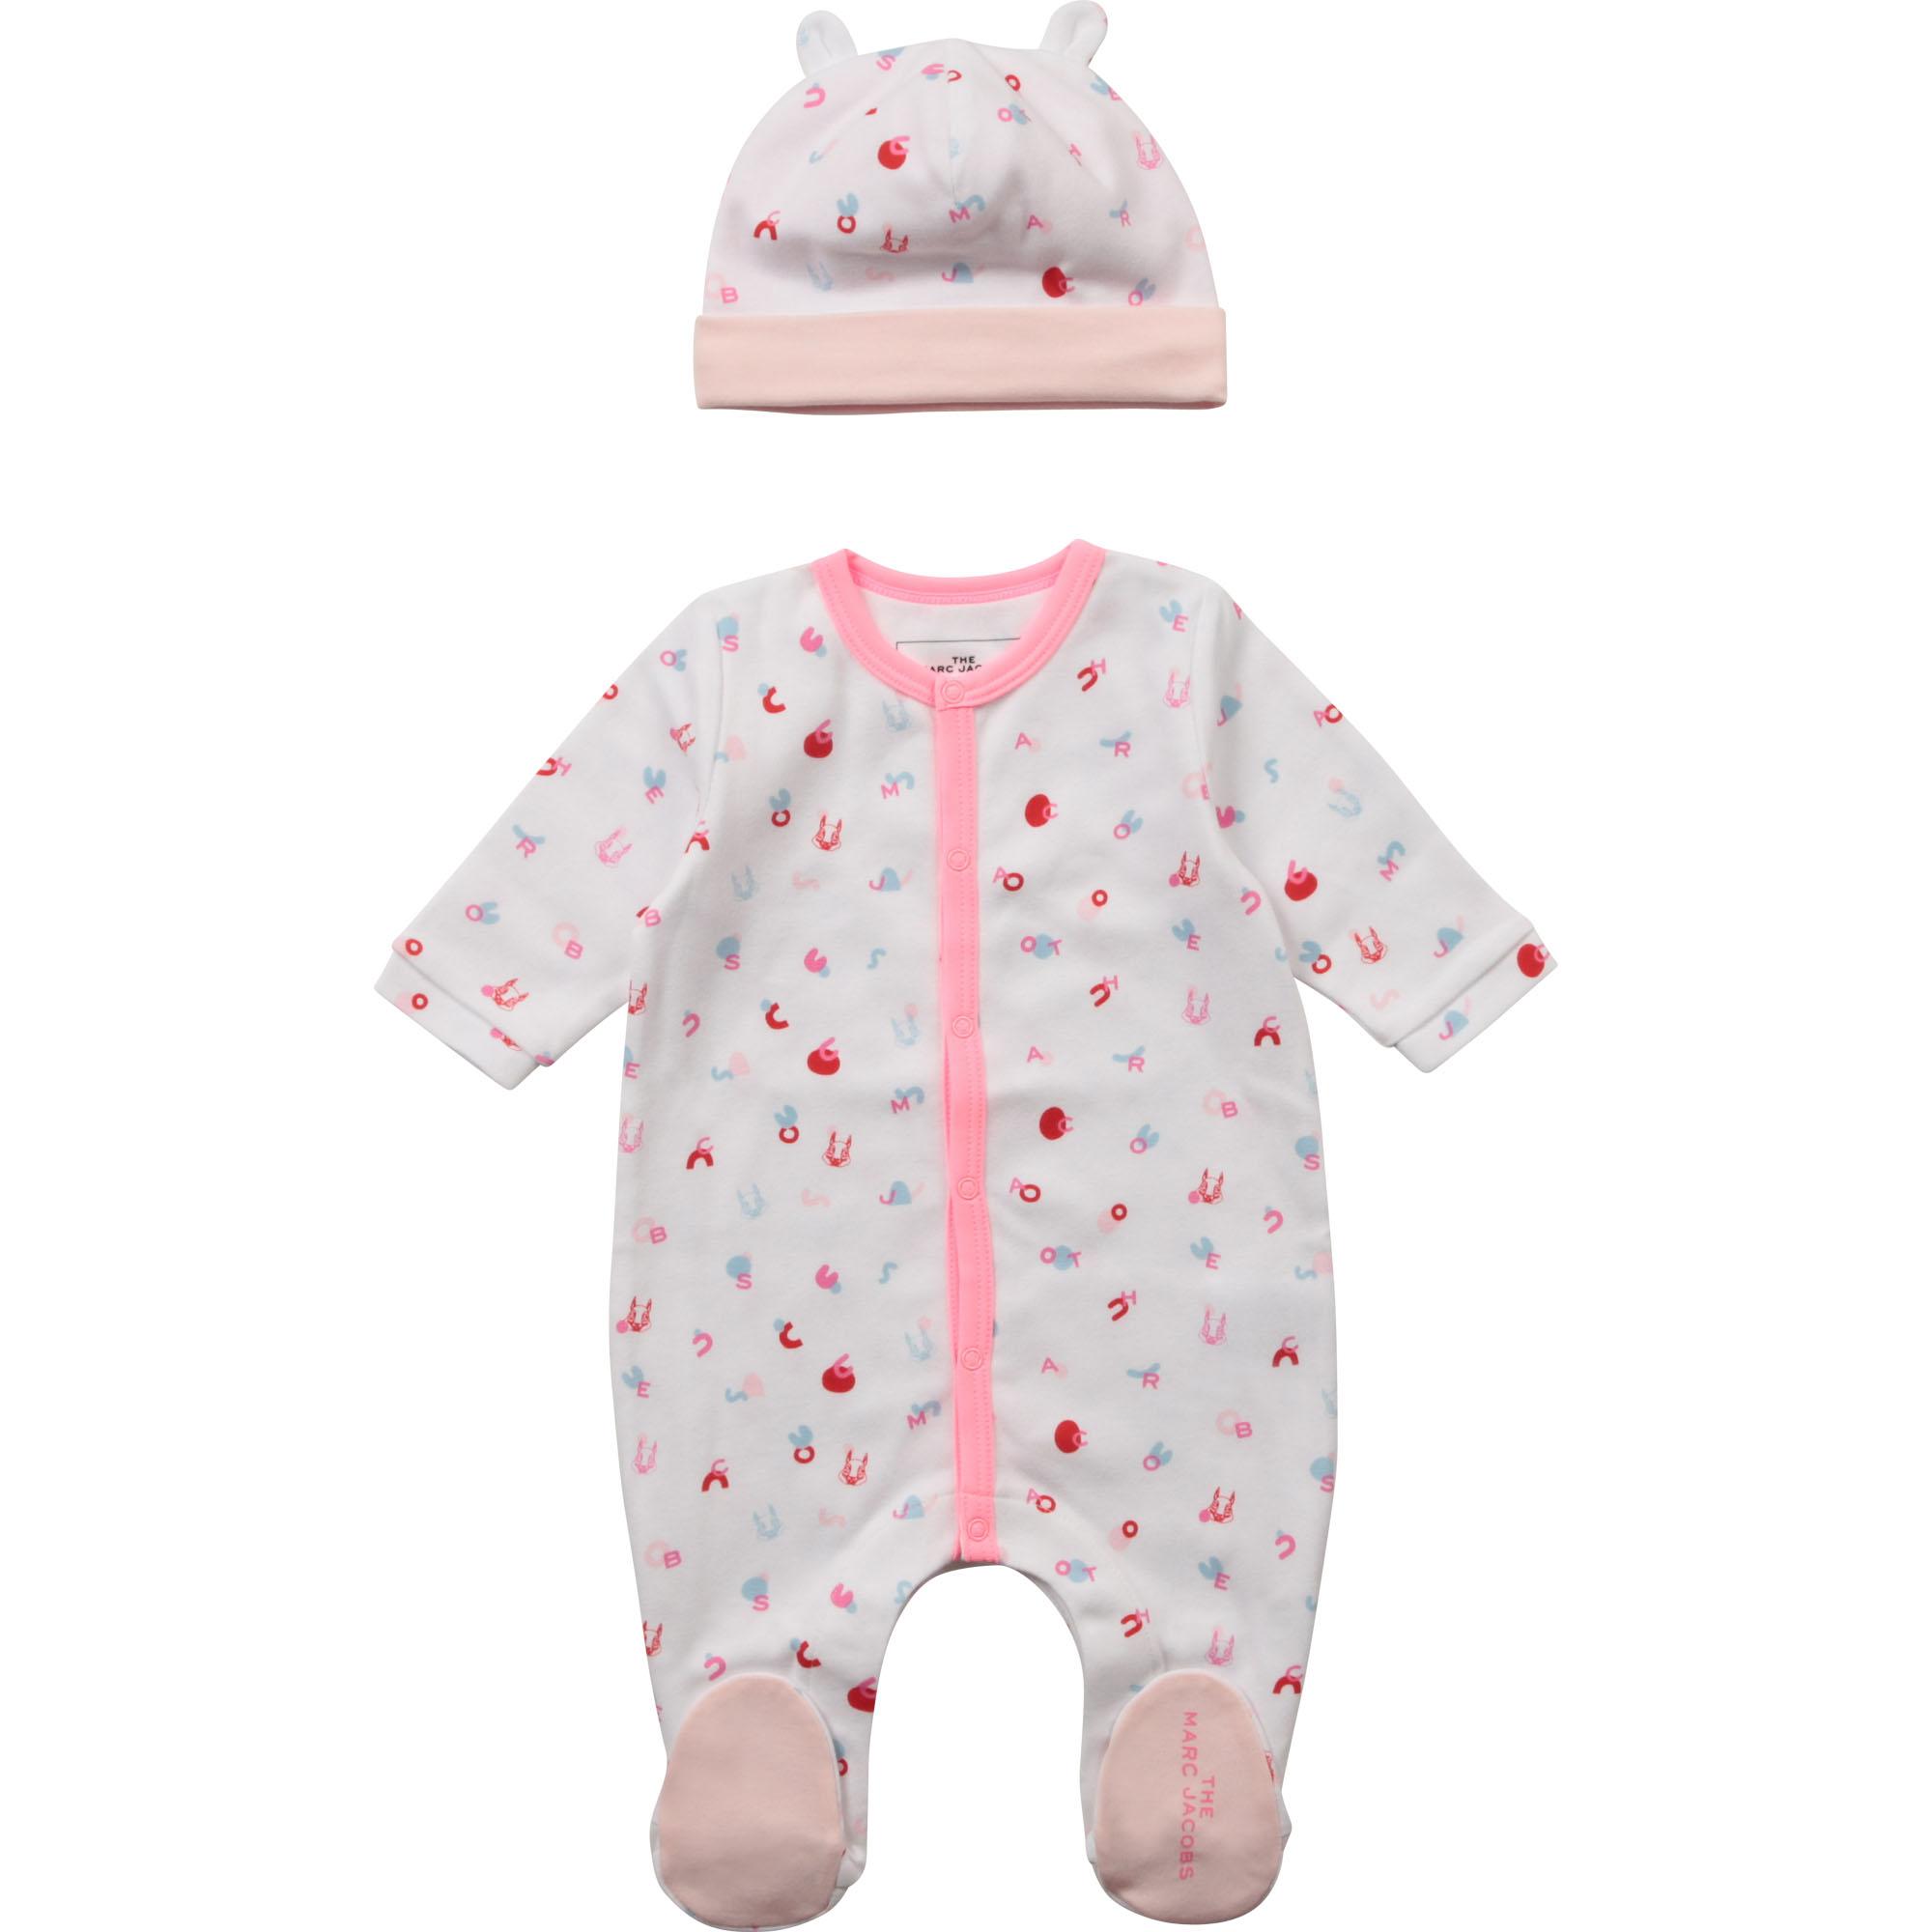 Ensemble pyjama + bonnet THE MARC JACOBS BEBE COUCHE UNISEXE Rose